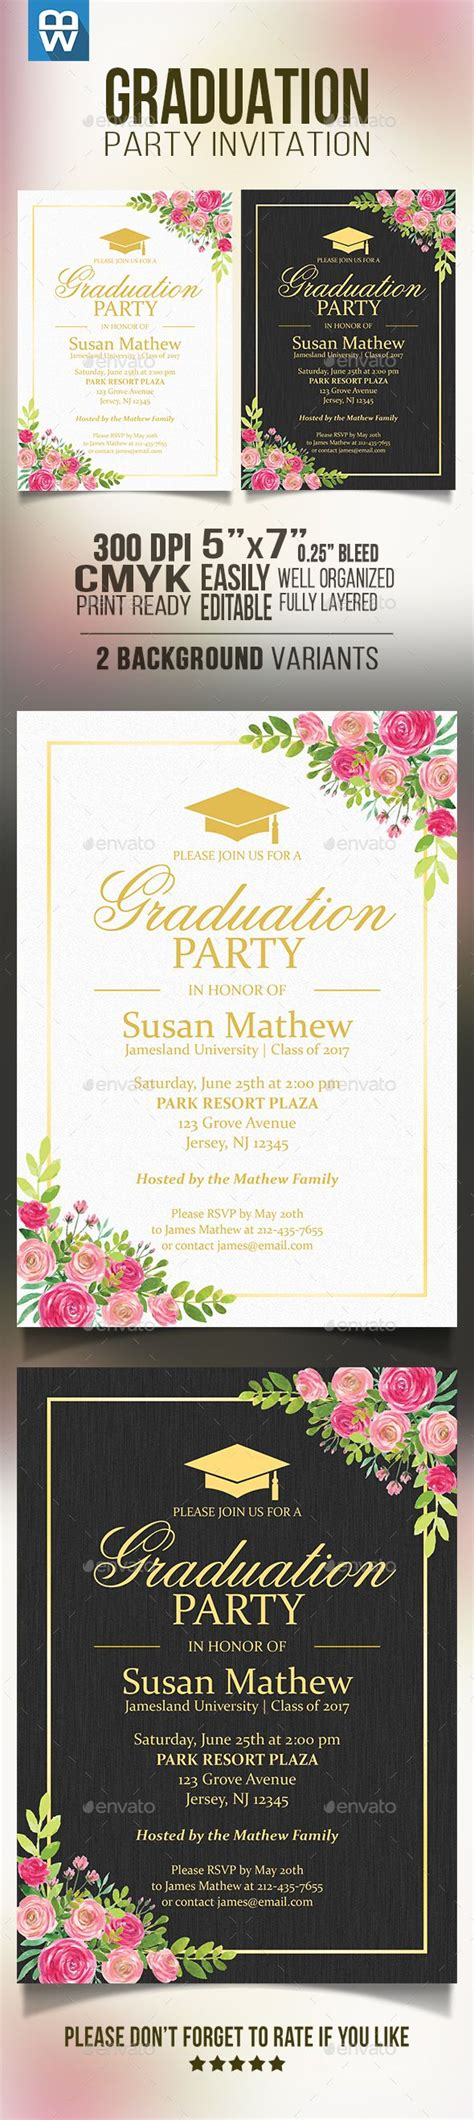 25 Unique Invitation Templates Ideas On Pinterest Free Invitation Templates Birthday Graduation Invitation Template